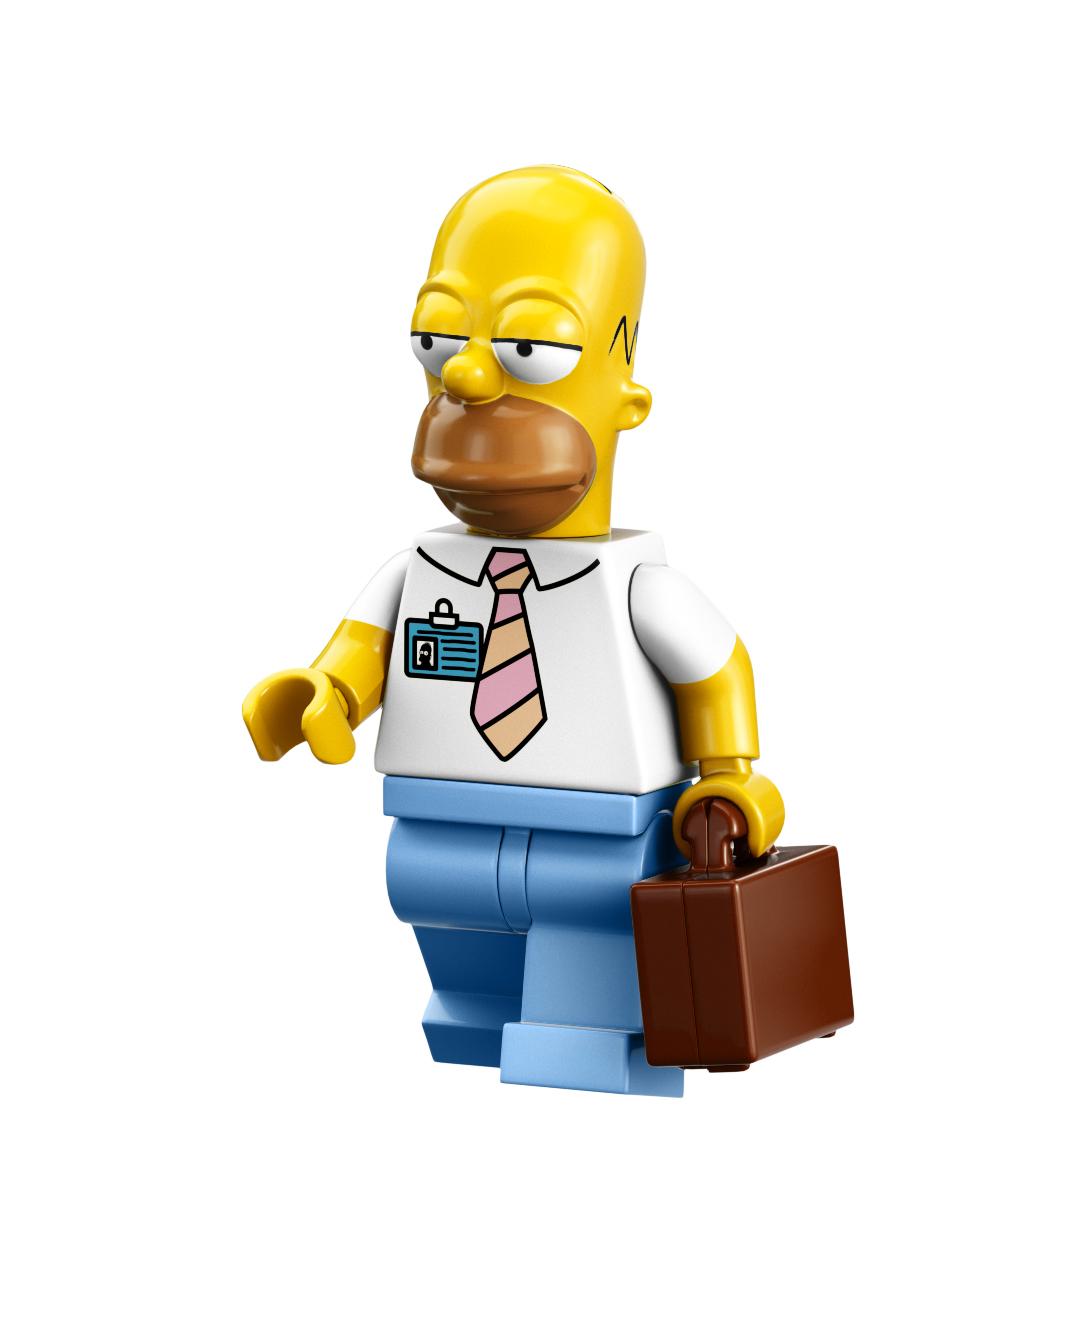 Maison-Lego-Simpsons-027